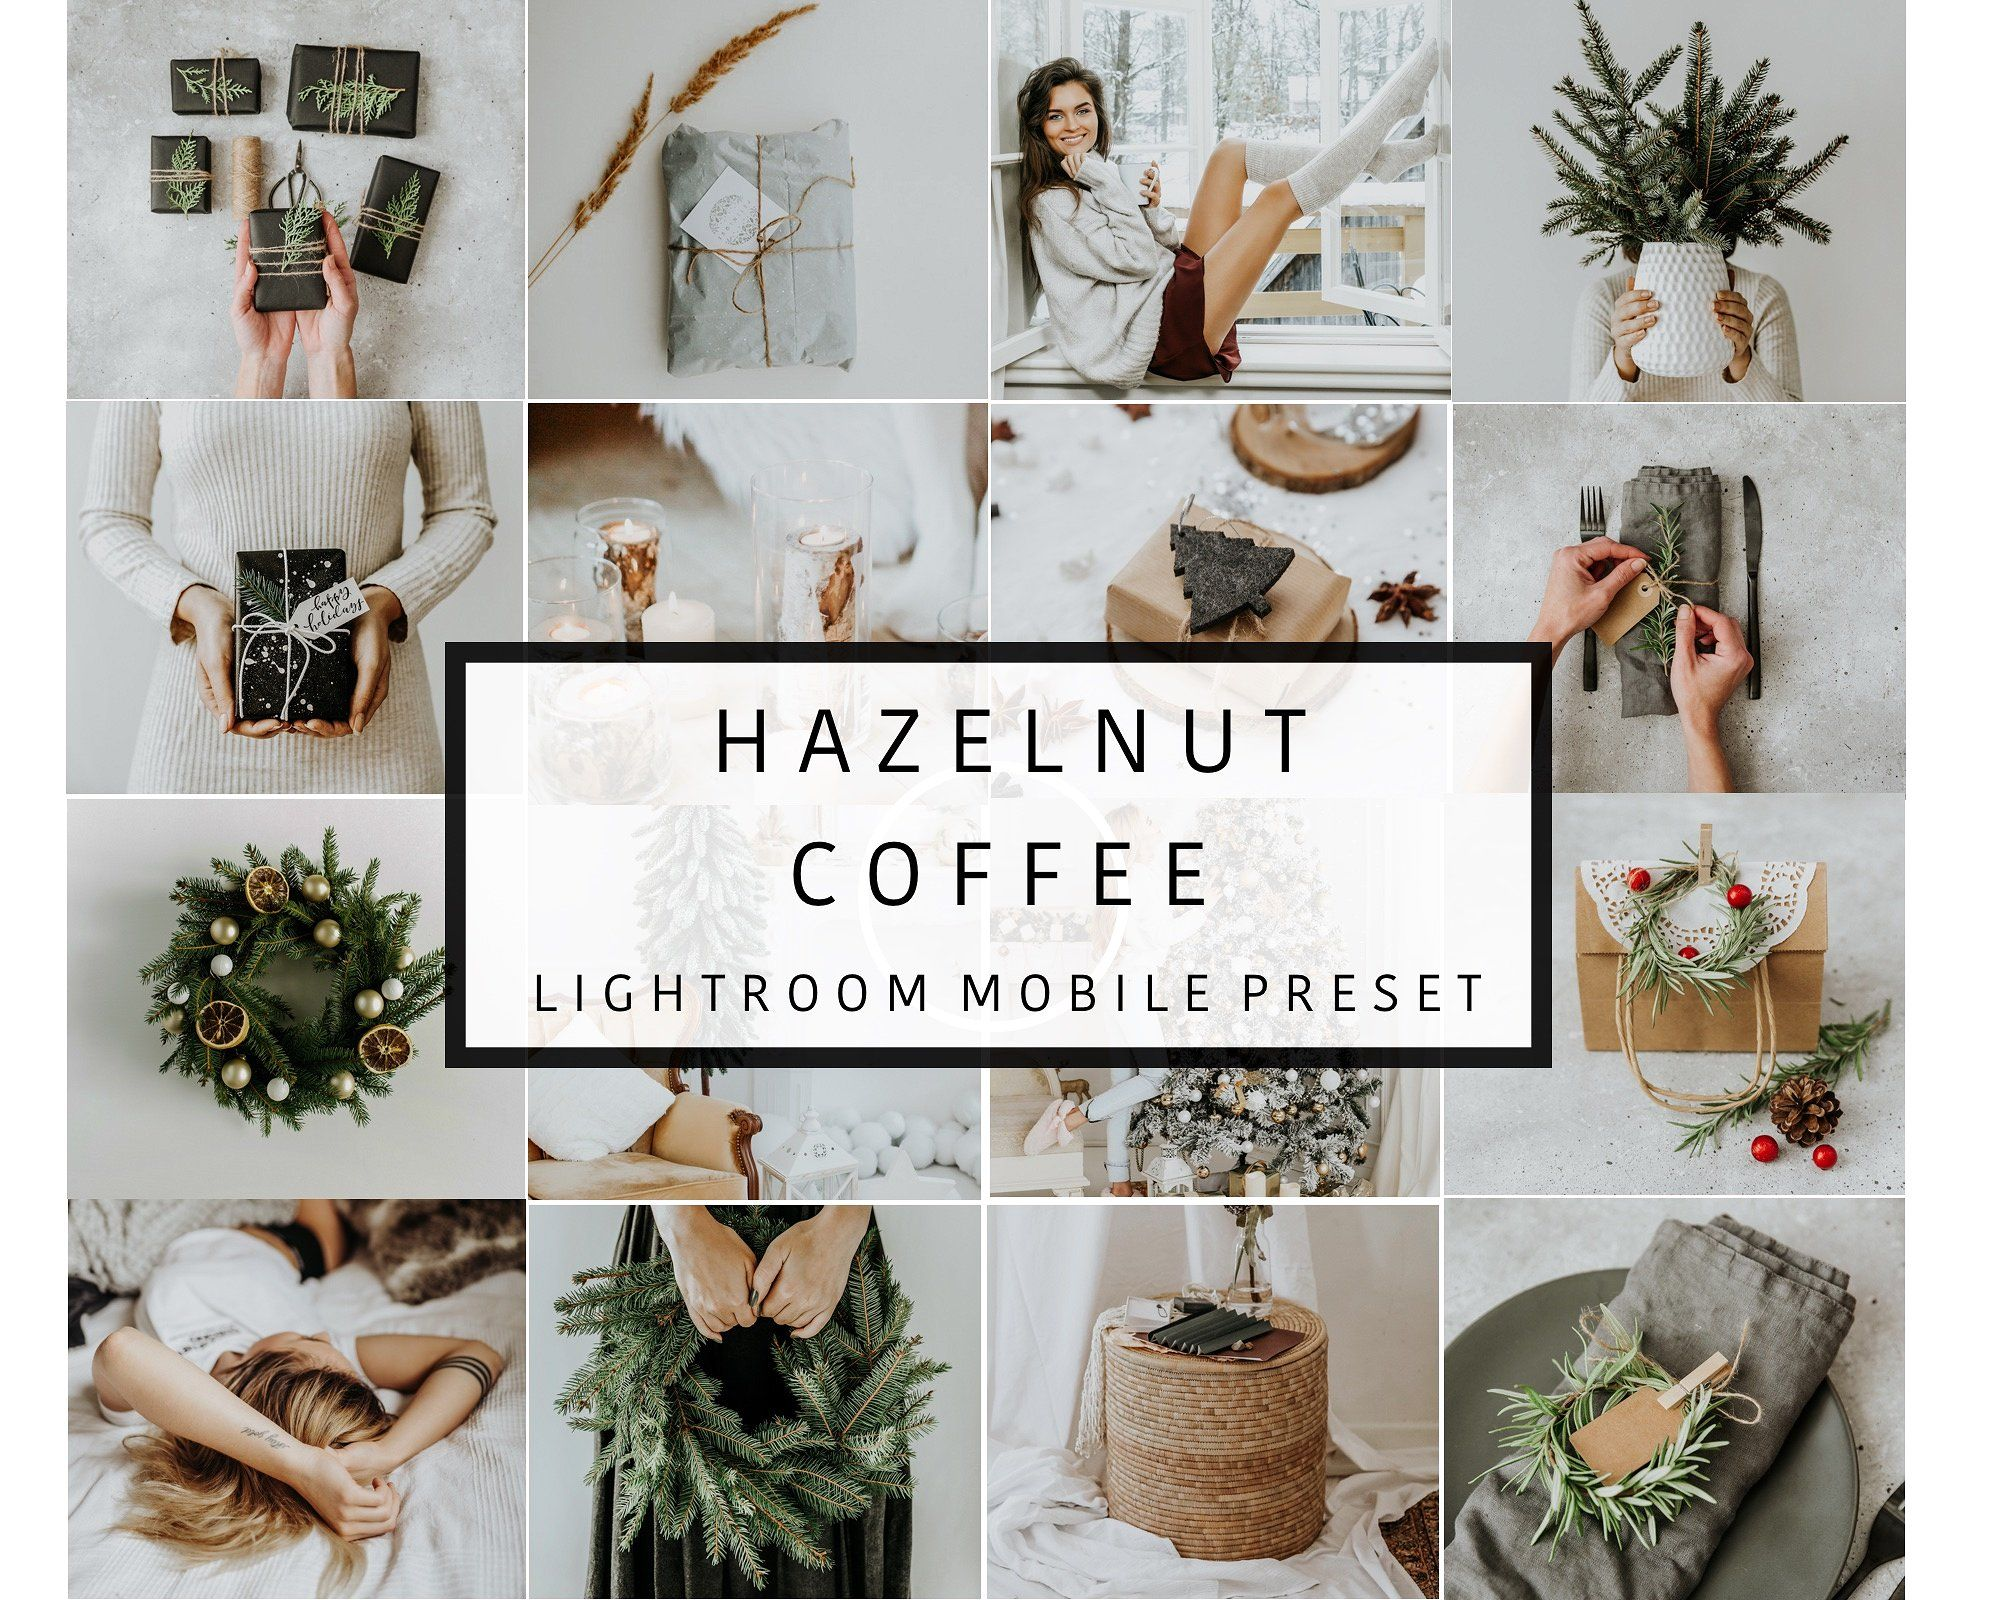 Mobile Preset HAZELNUT COFFEE MOBILEAPPFORMATLIGHTROOM